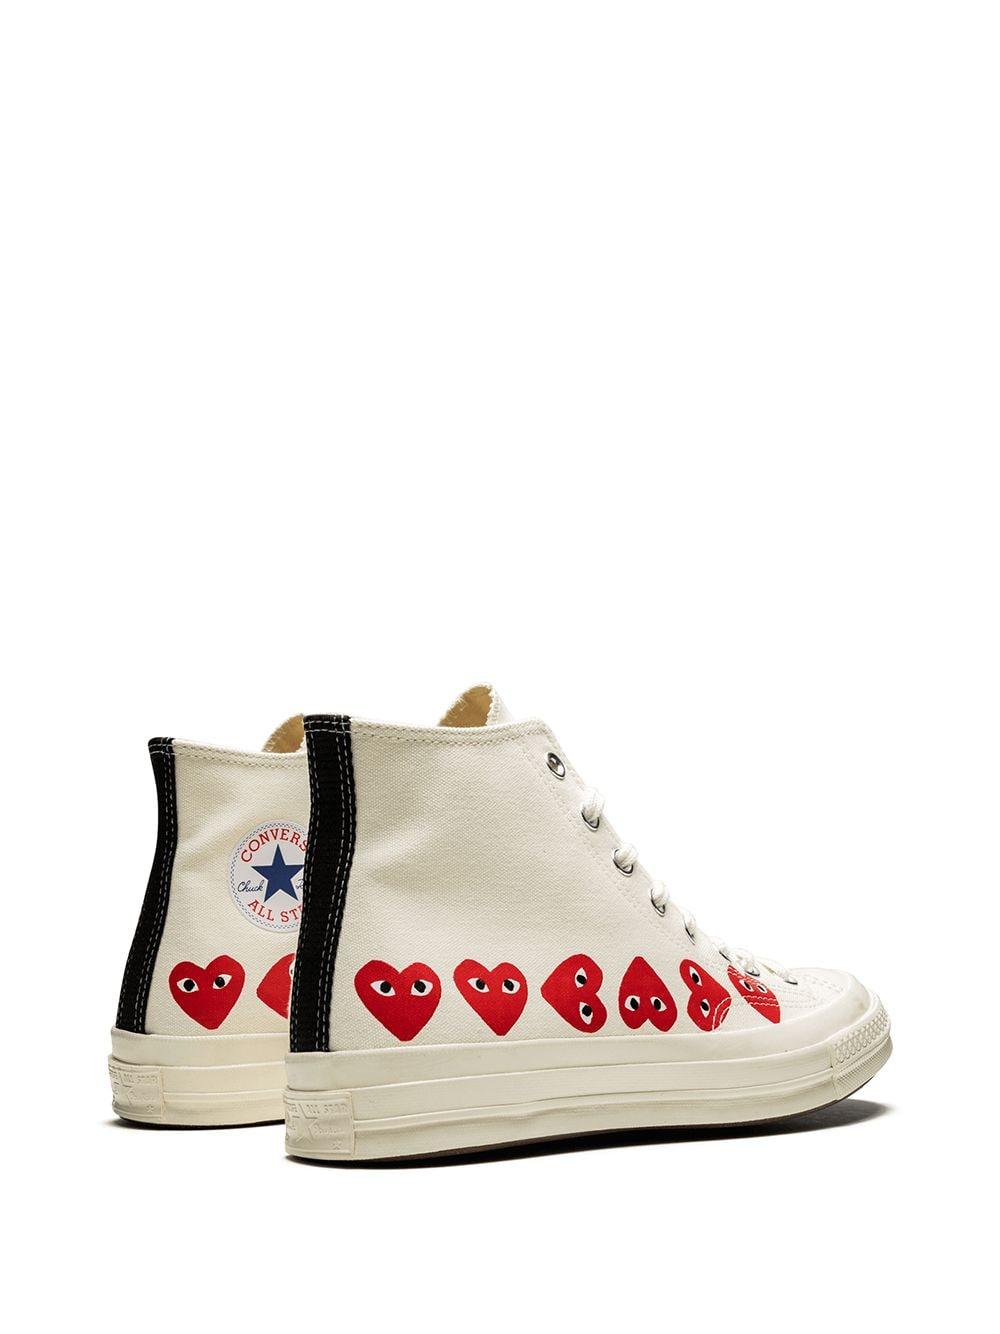 2. kép: CONVERSE Multiheart sneaker